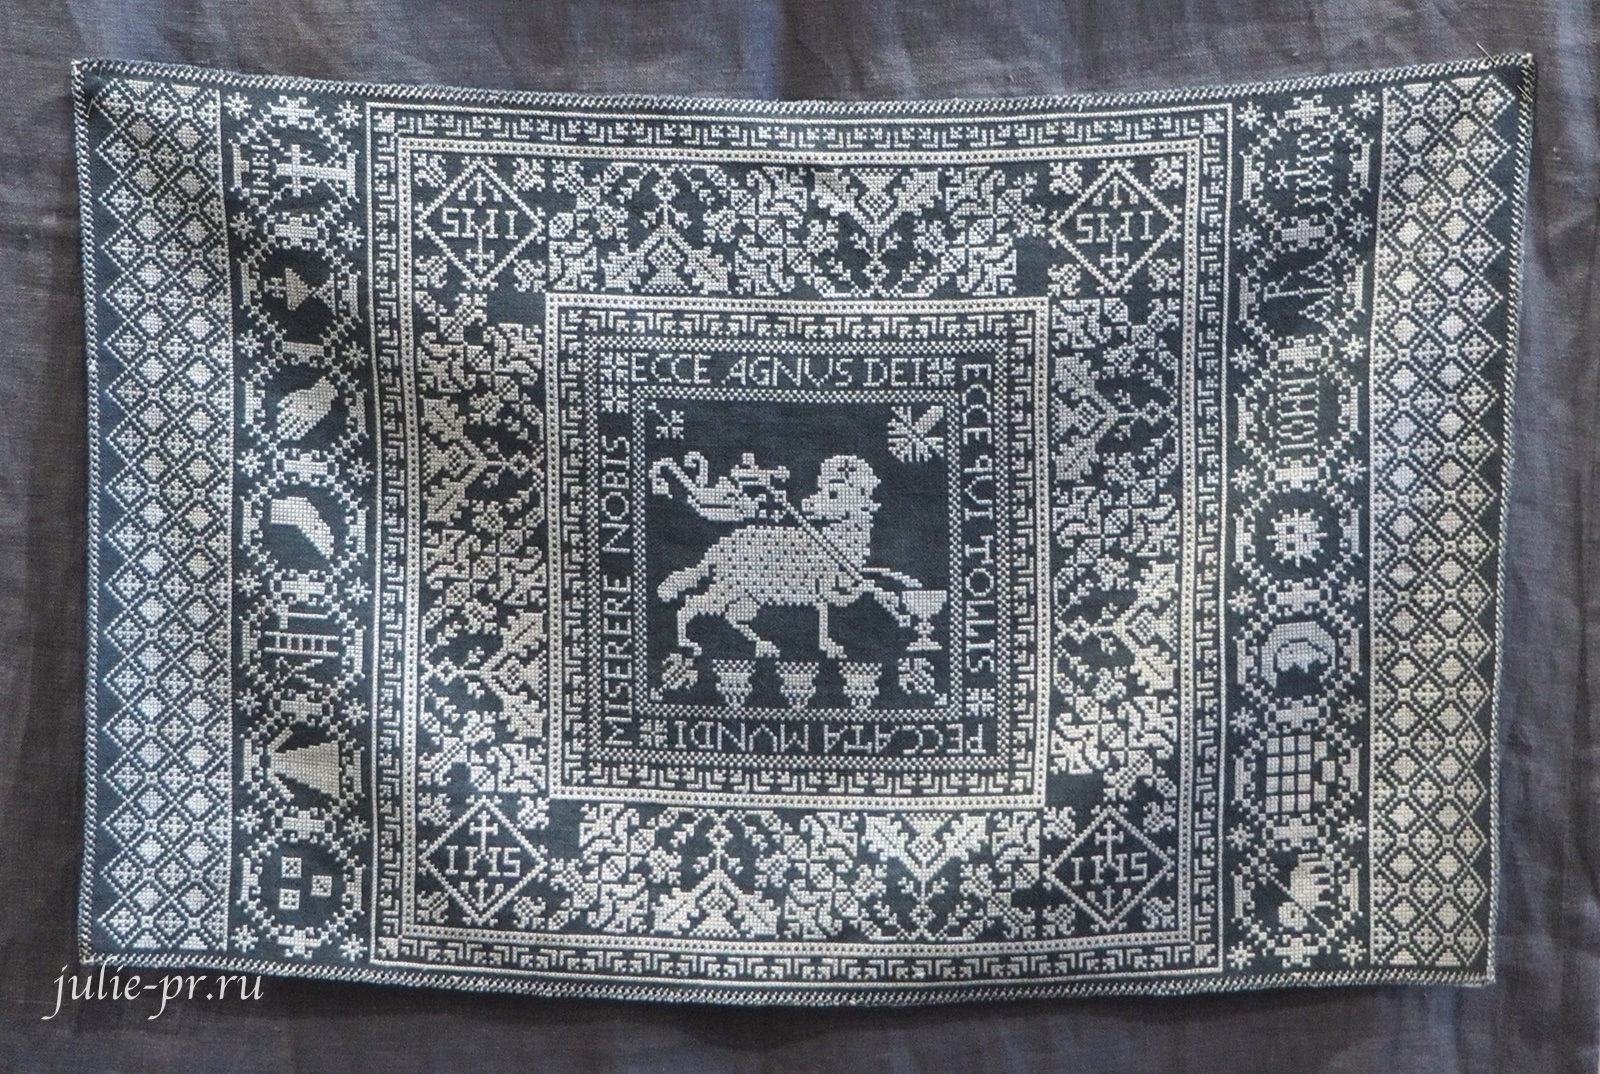 Modern Folk Embroidery, вышивка крестом, примитив, квакер, Fili Senza Tempo